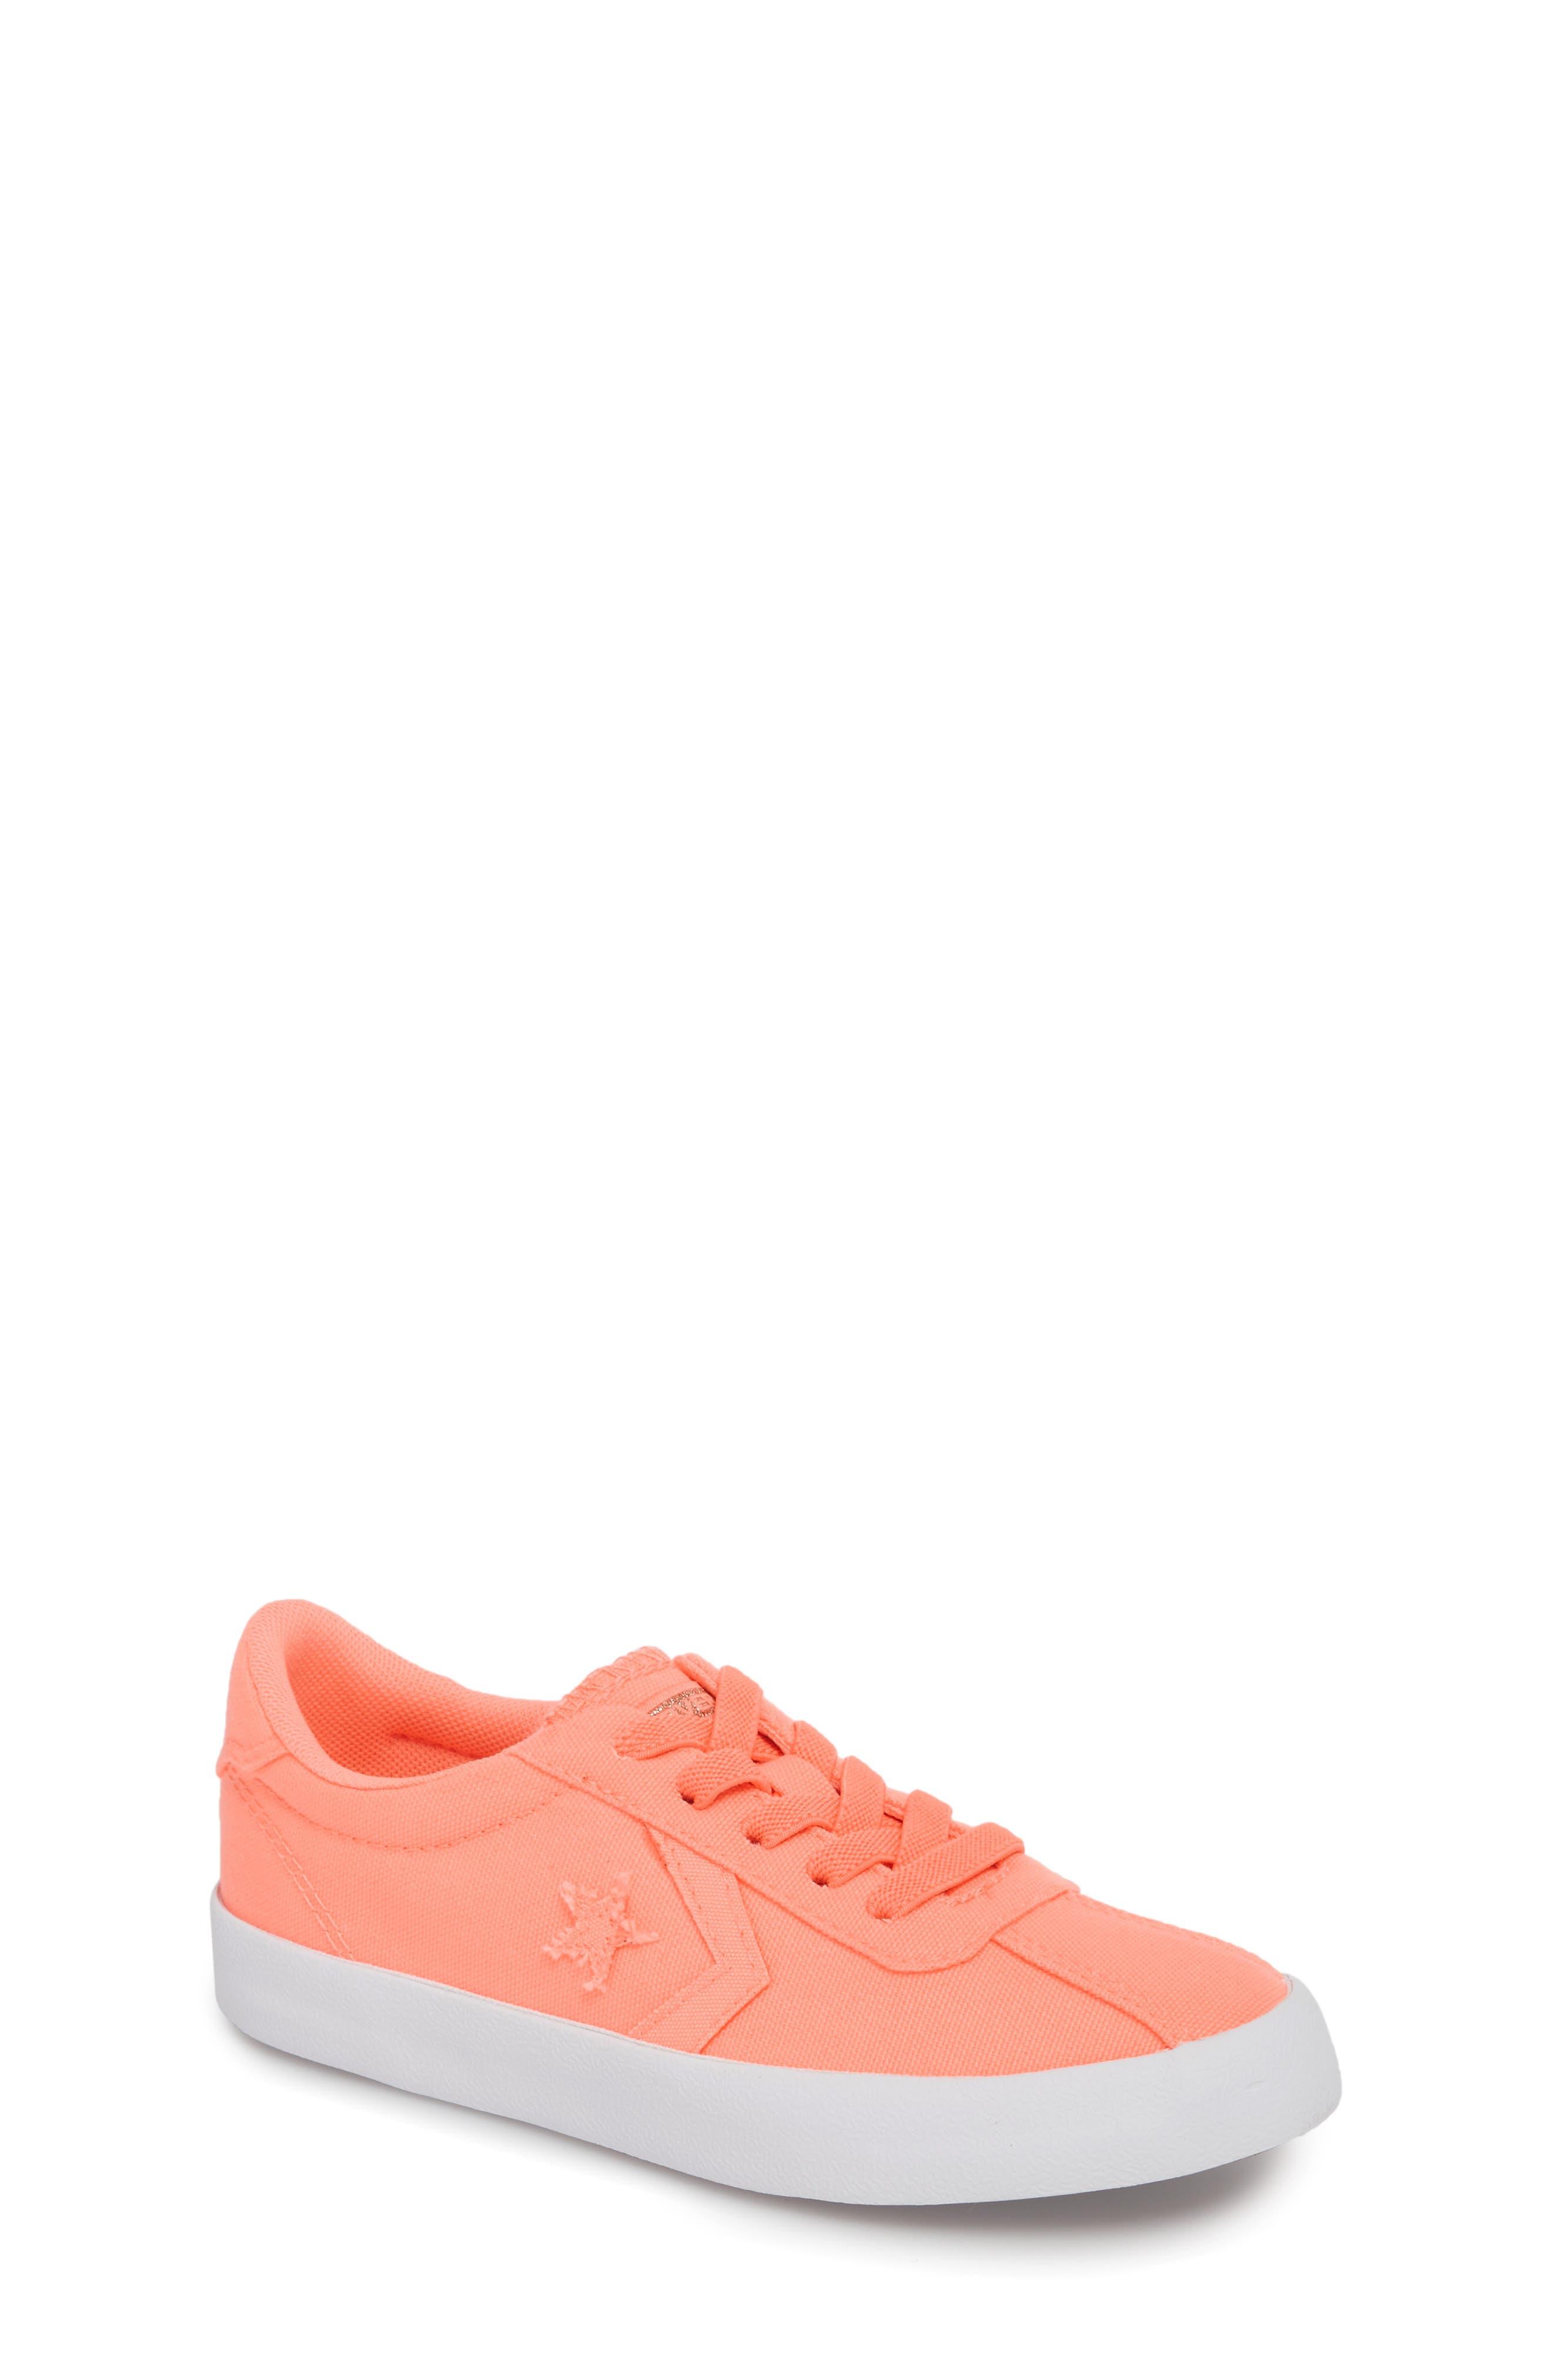 Breakpoint Sneaker,                             Main thumbnail 1, color,                             Crimson